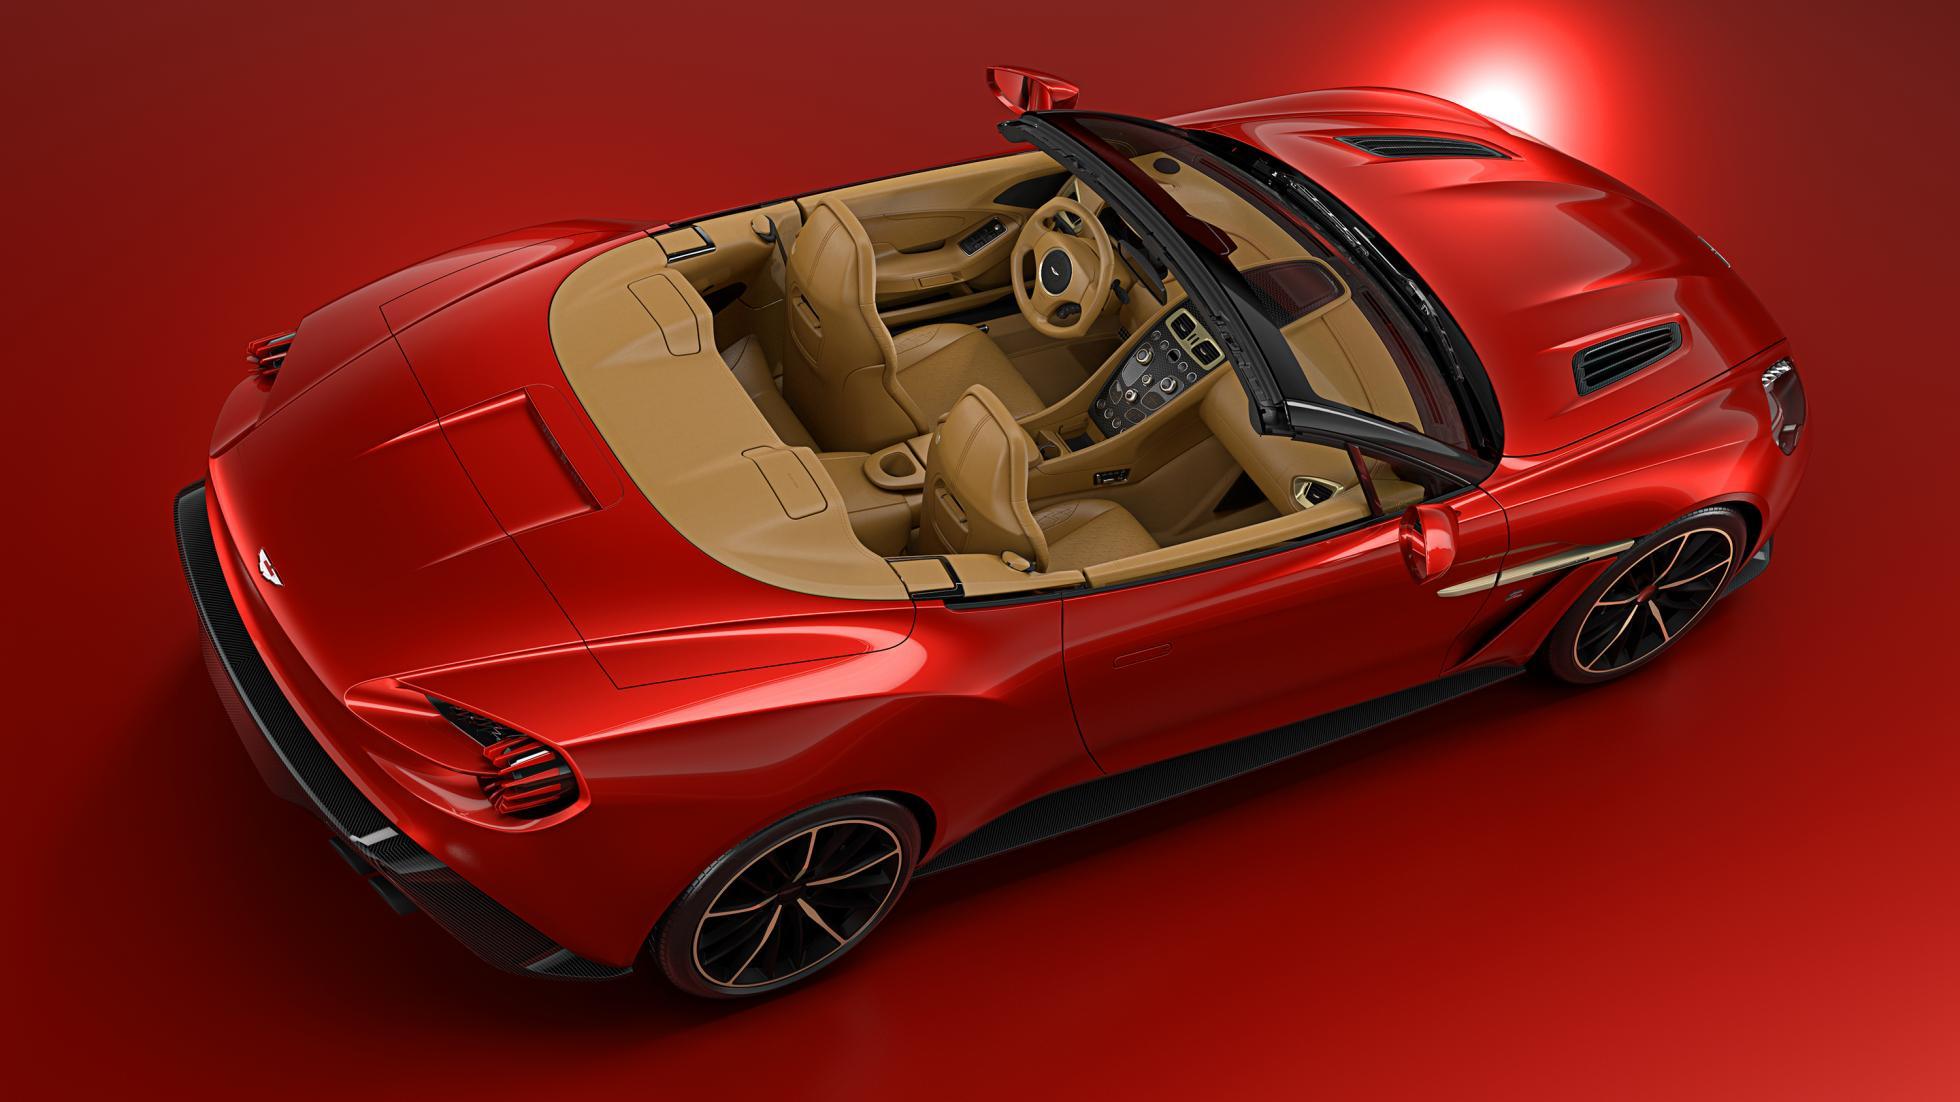 Vanquish Zagato Coupe © Aston Martin Lagonda Limited